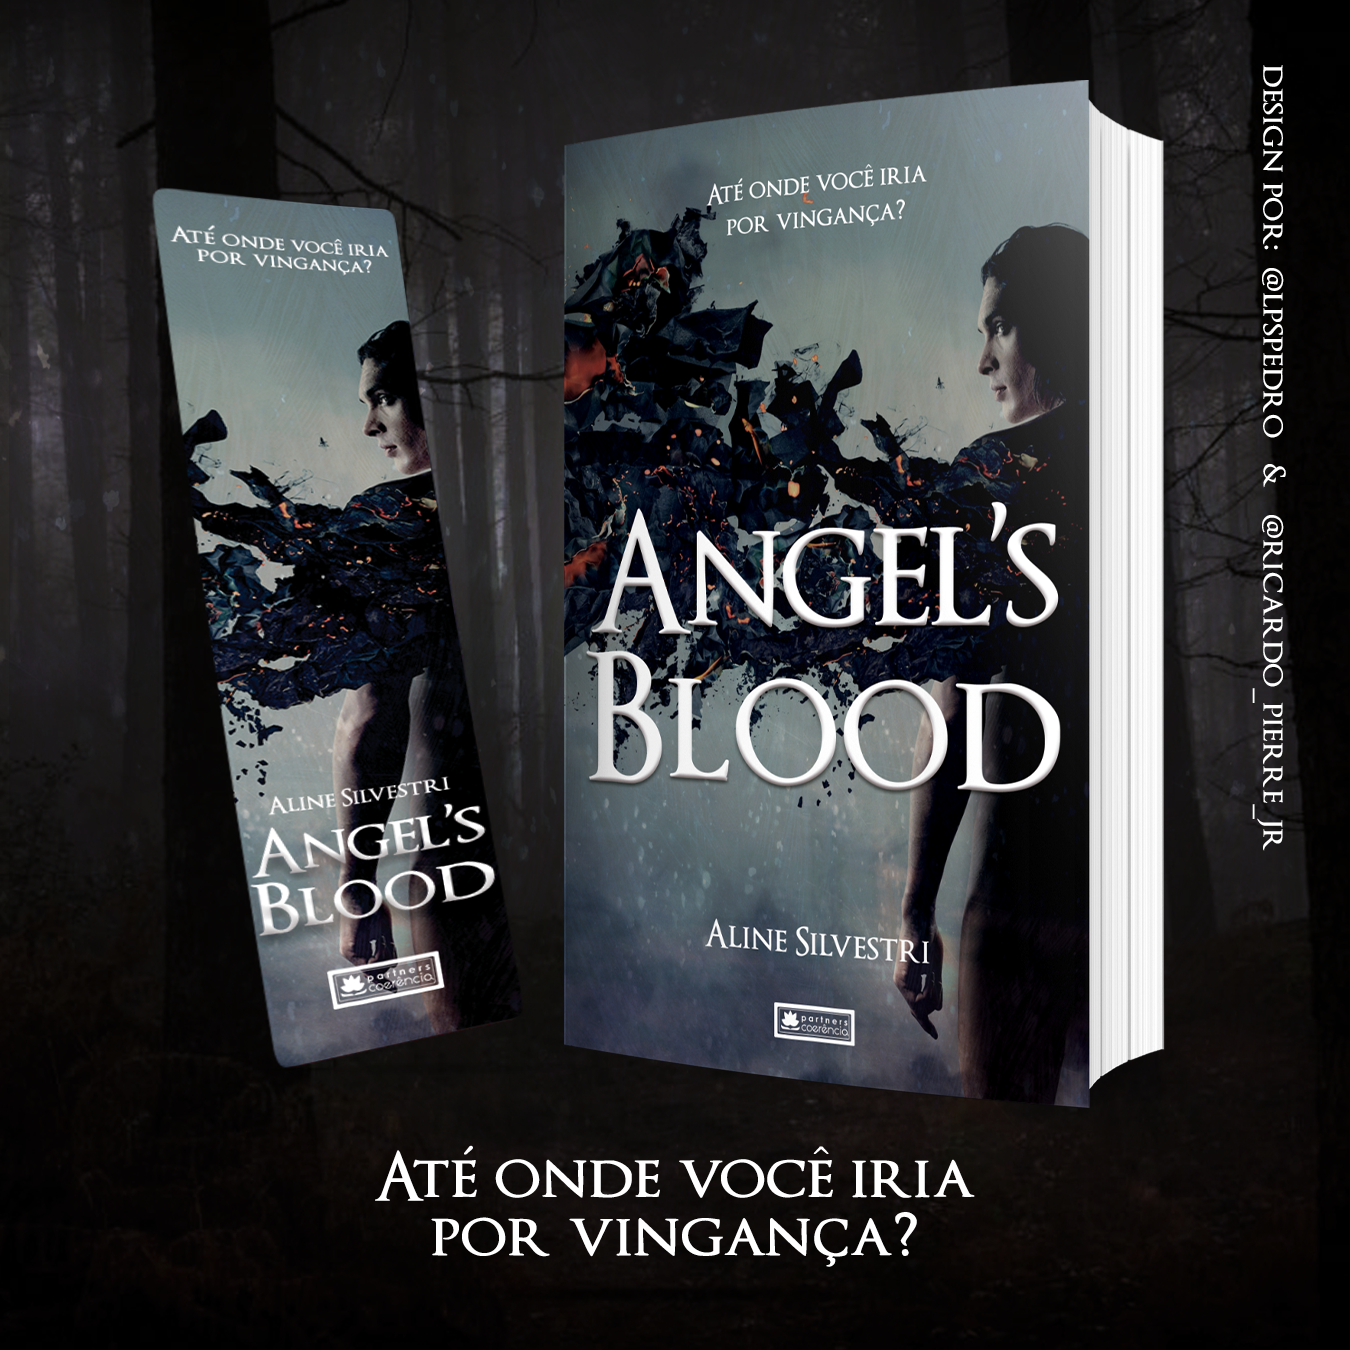 Angel's Blood